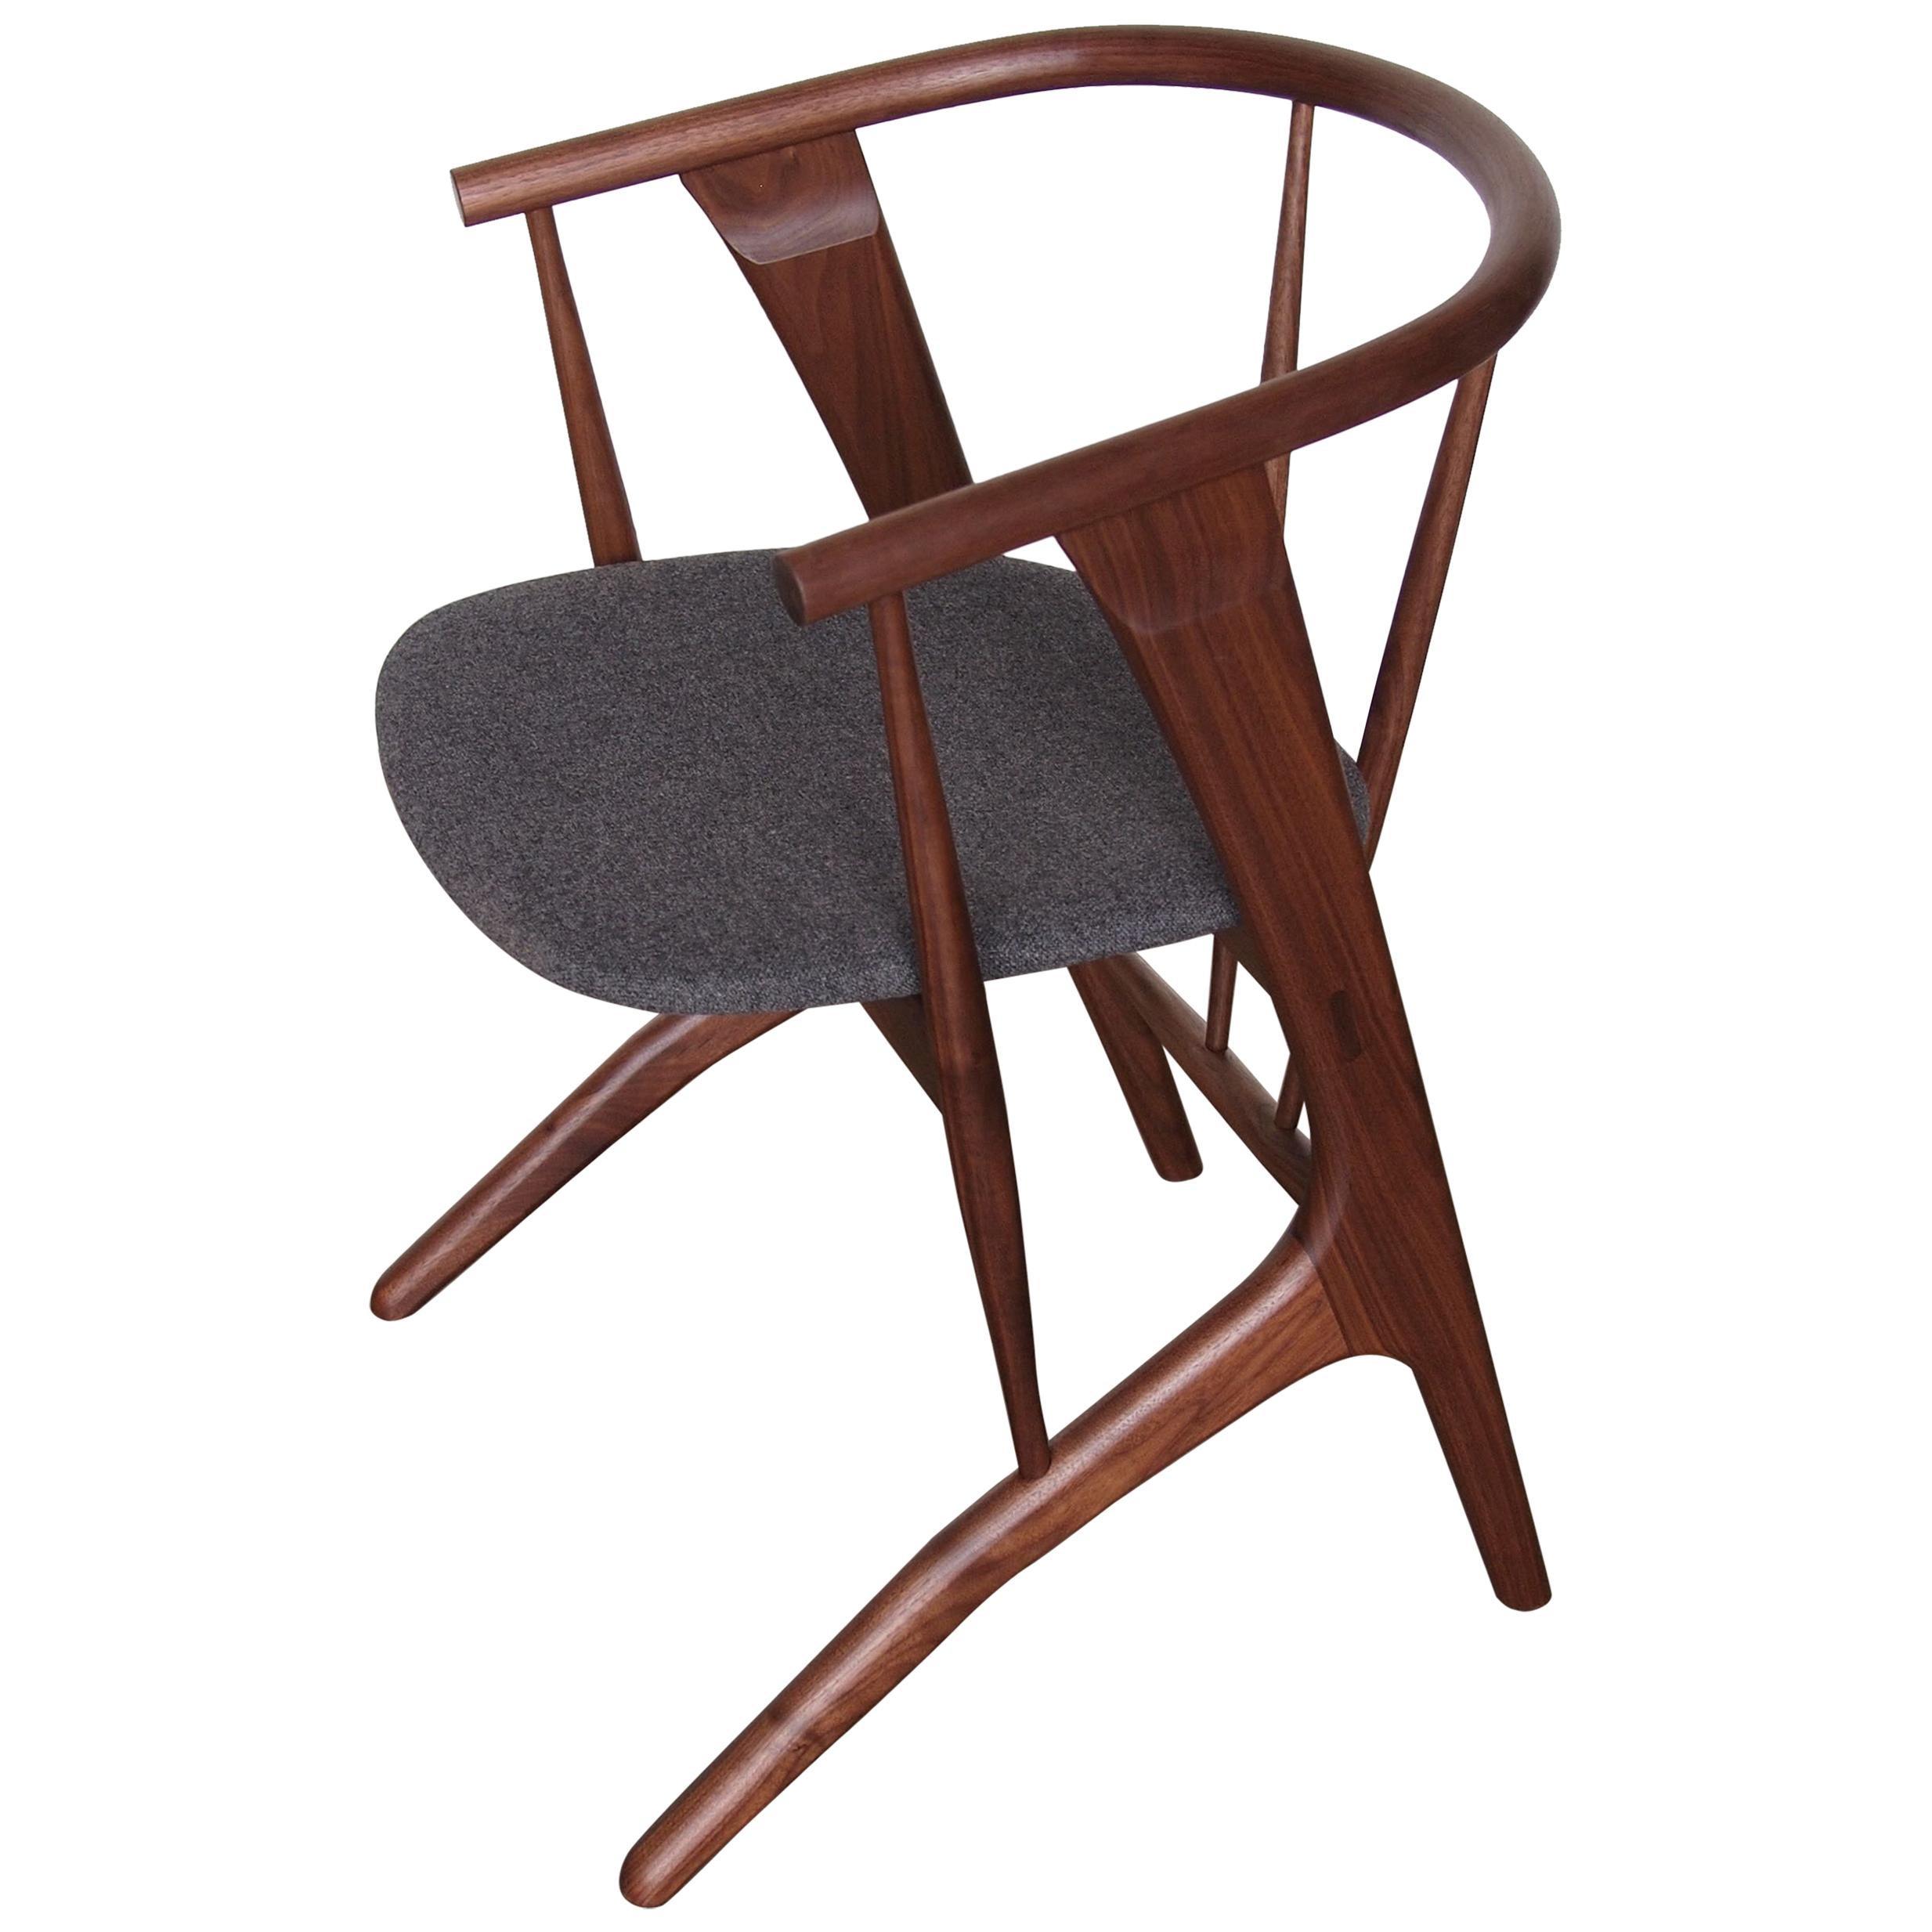 Phloem Studio Zoe Chair, Handmade Modern Walnut Dining Chair with Upholstery